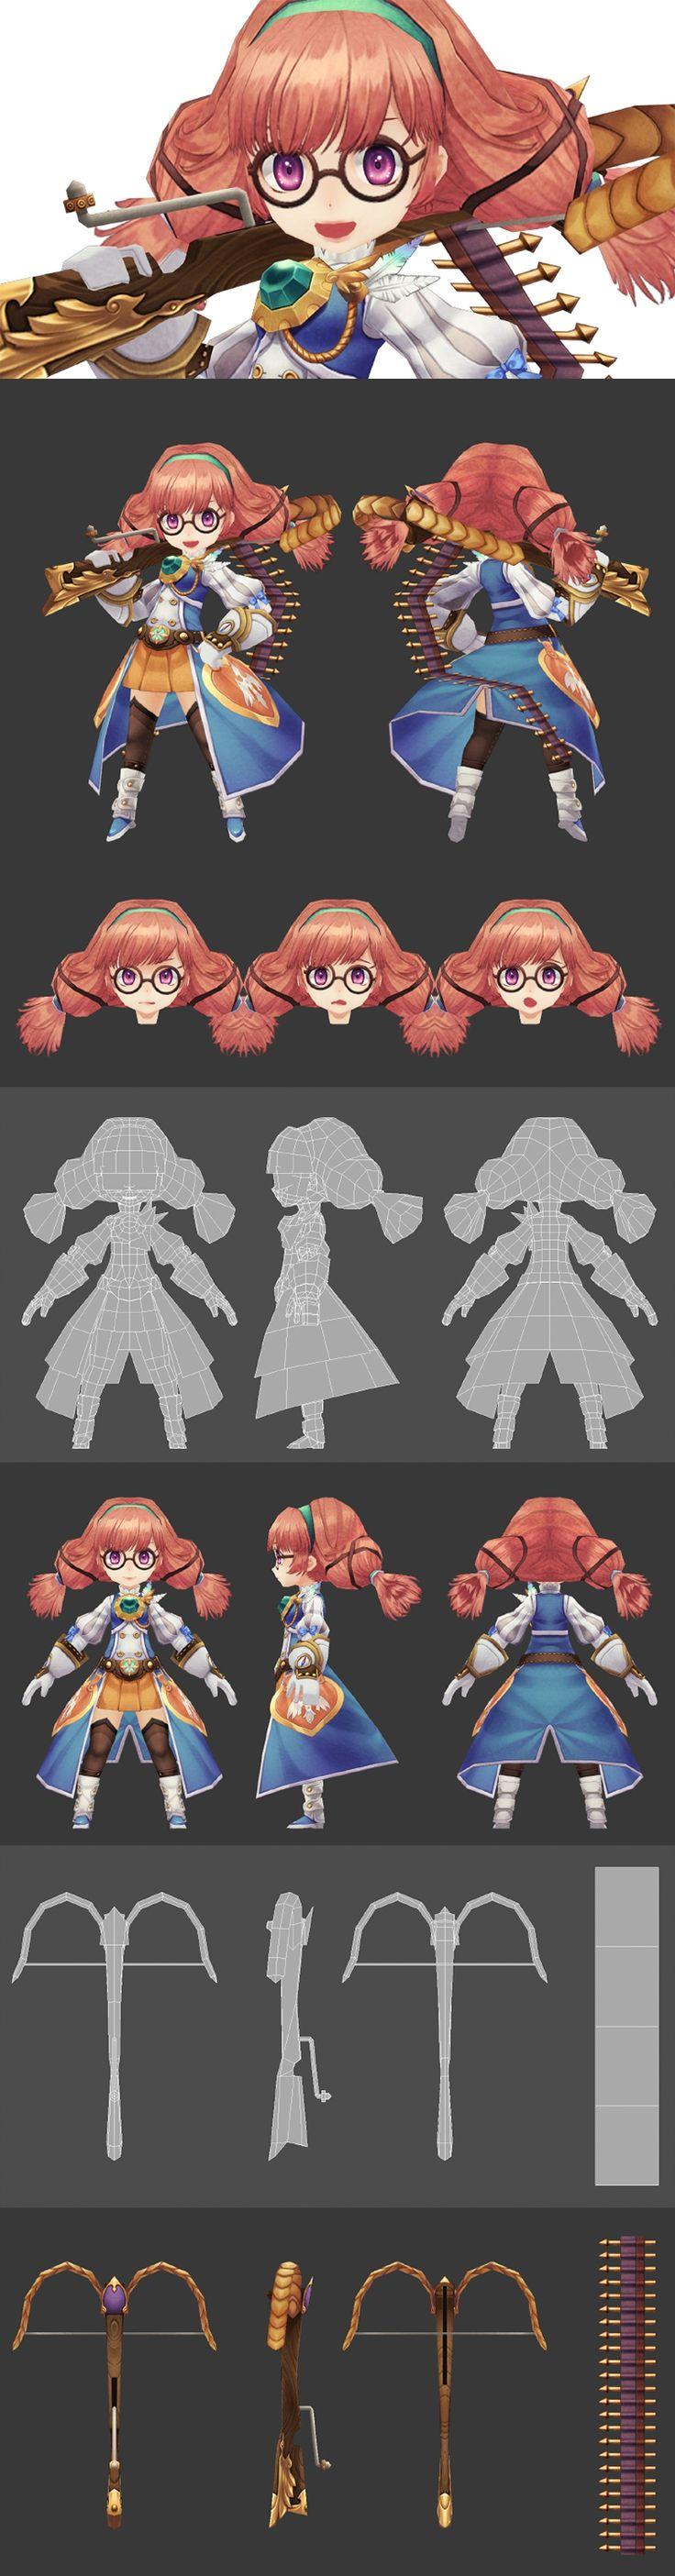 CGNI Student  캐릭터 로우미들과정 - 박진주